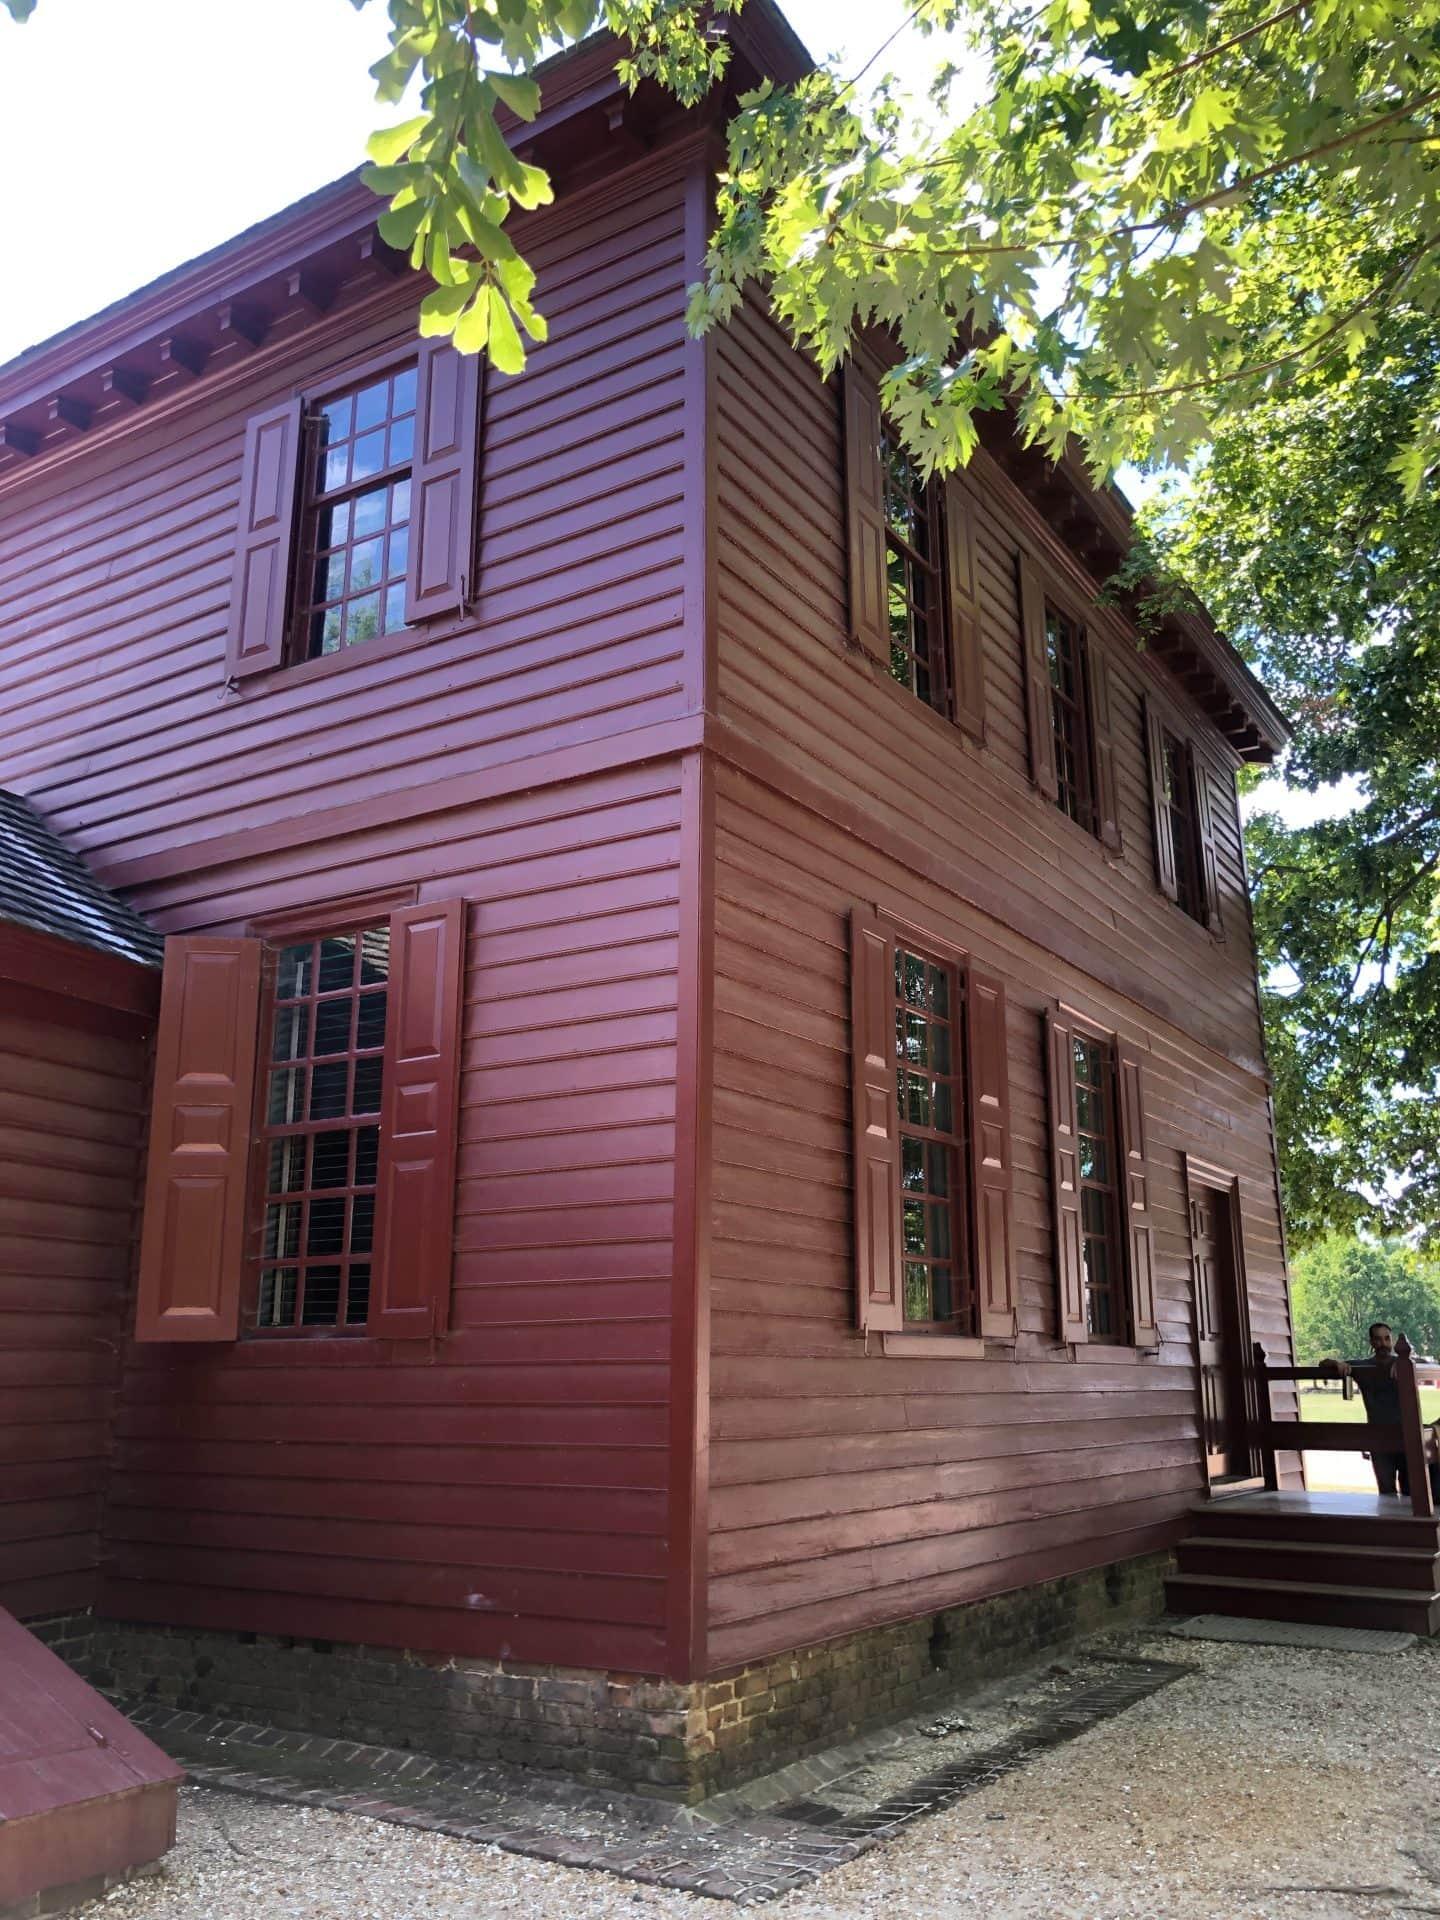 Randolph House in Colonial Williamsburg Virginia